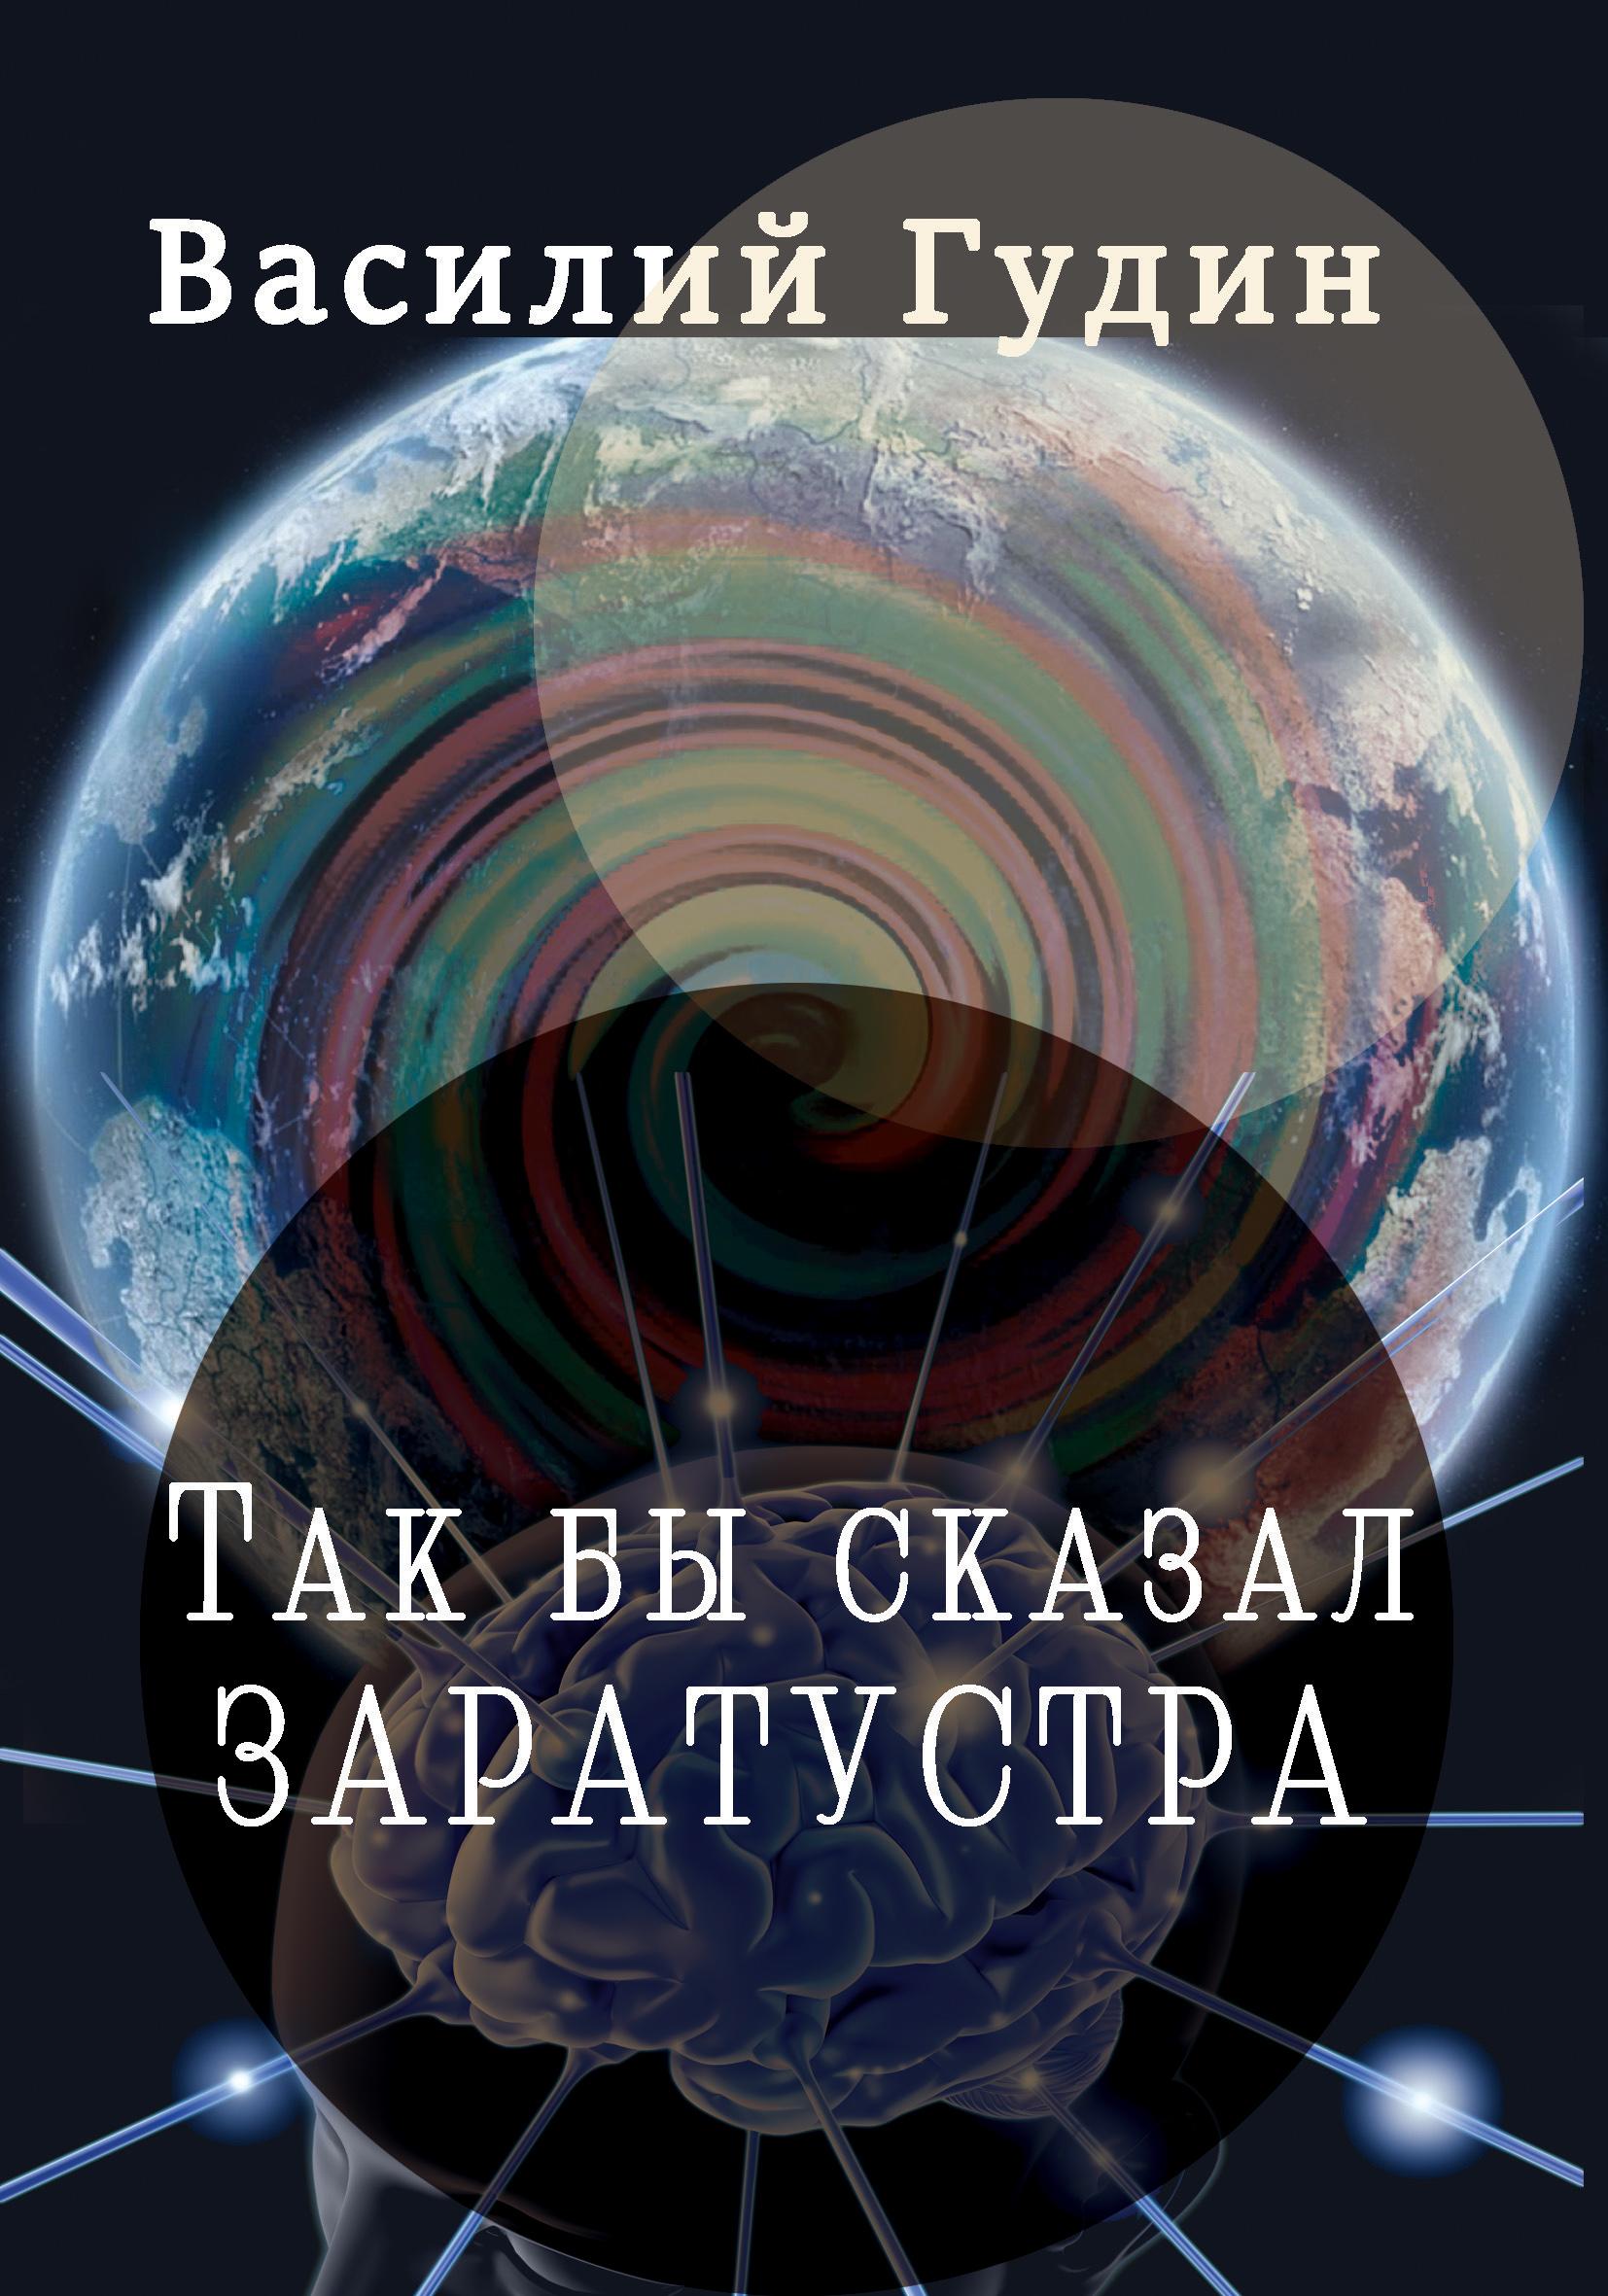 Василий Гудин Так бы сказал Заратустра василий гудин так бы сказал заратустра